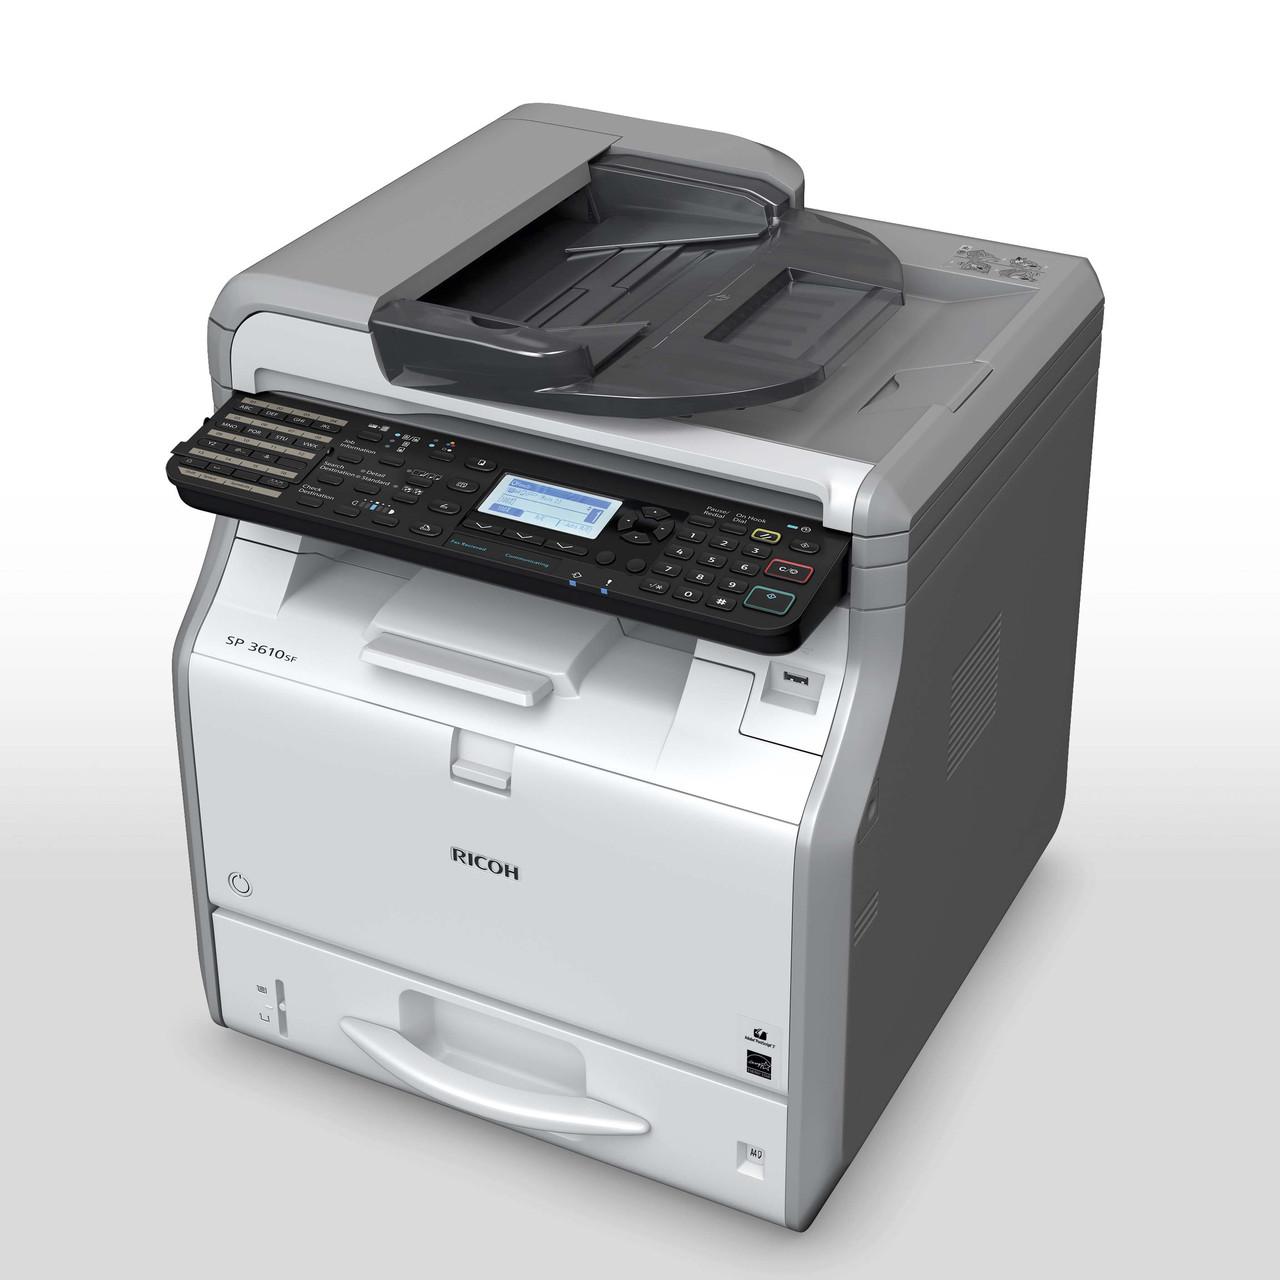 Ricoh SP 3610SF – МФУ А4 формата, 30 стр./мин, сетевой принтер, цветной сканер, копир, факс G3.